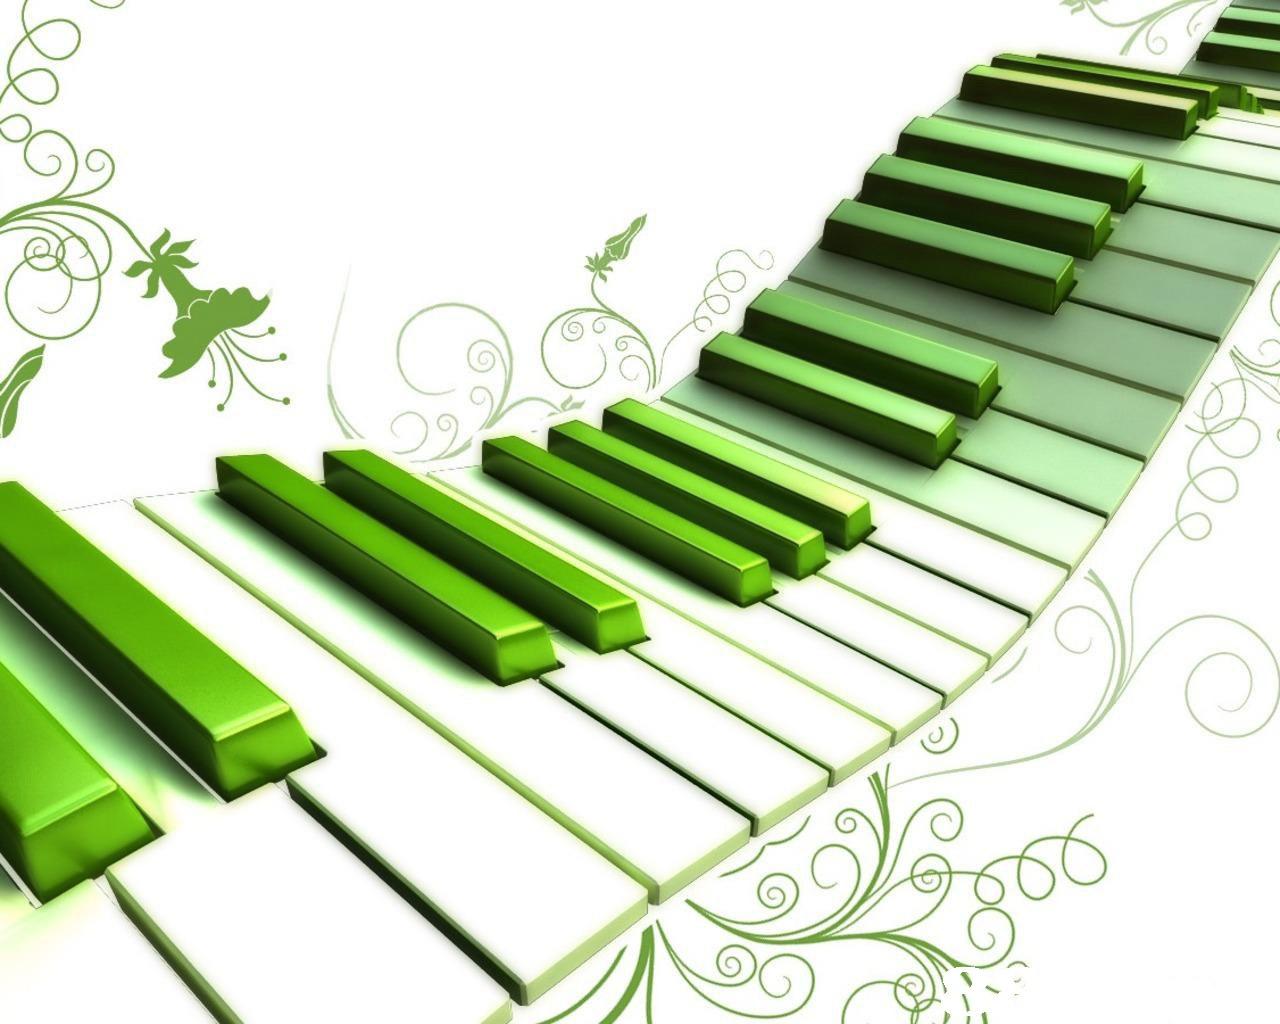 green,keyboard,technology,piano,musical keyboard